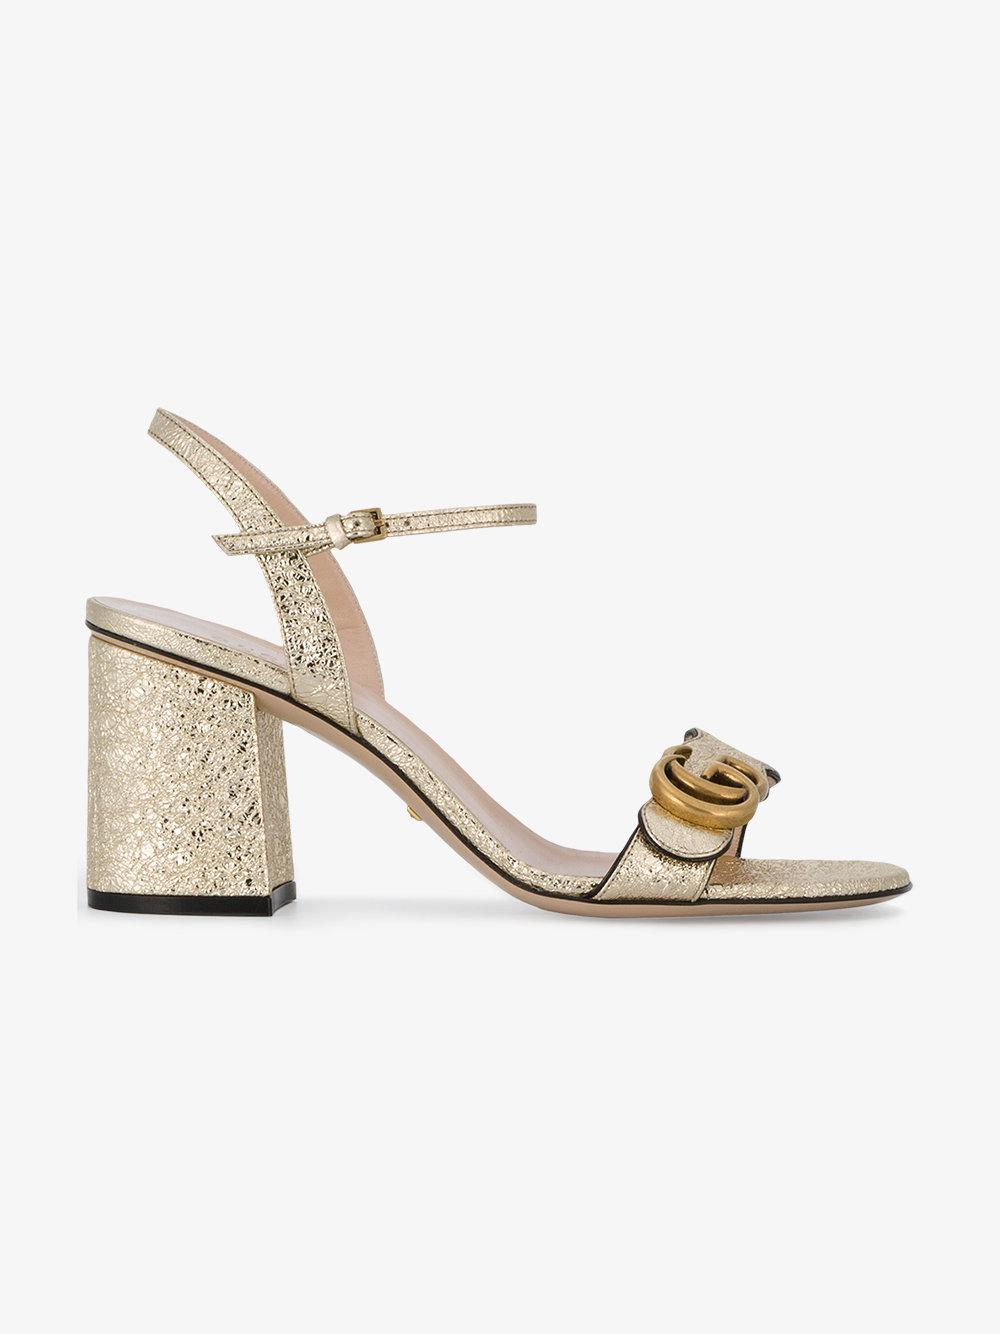 8efb8489db5 Lyst - Gucci Marmont Metallic Sandals in Metallic - Save 8%